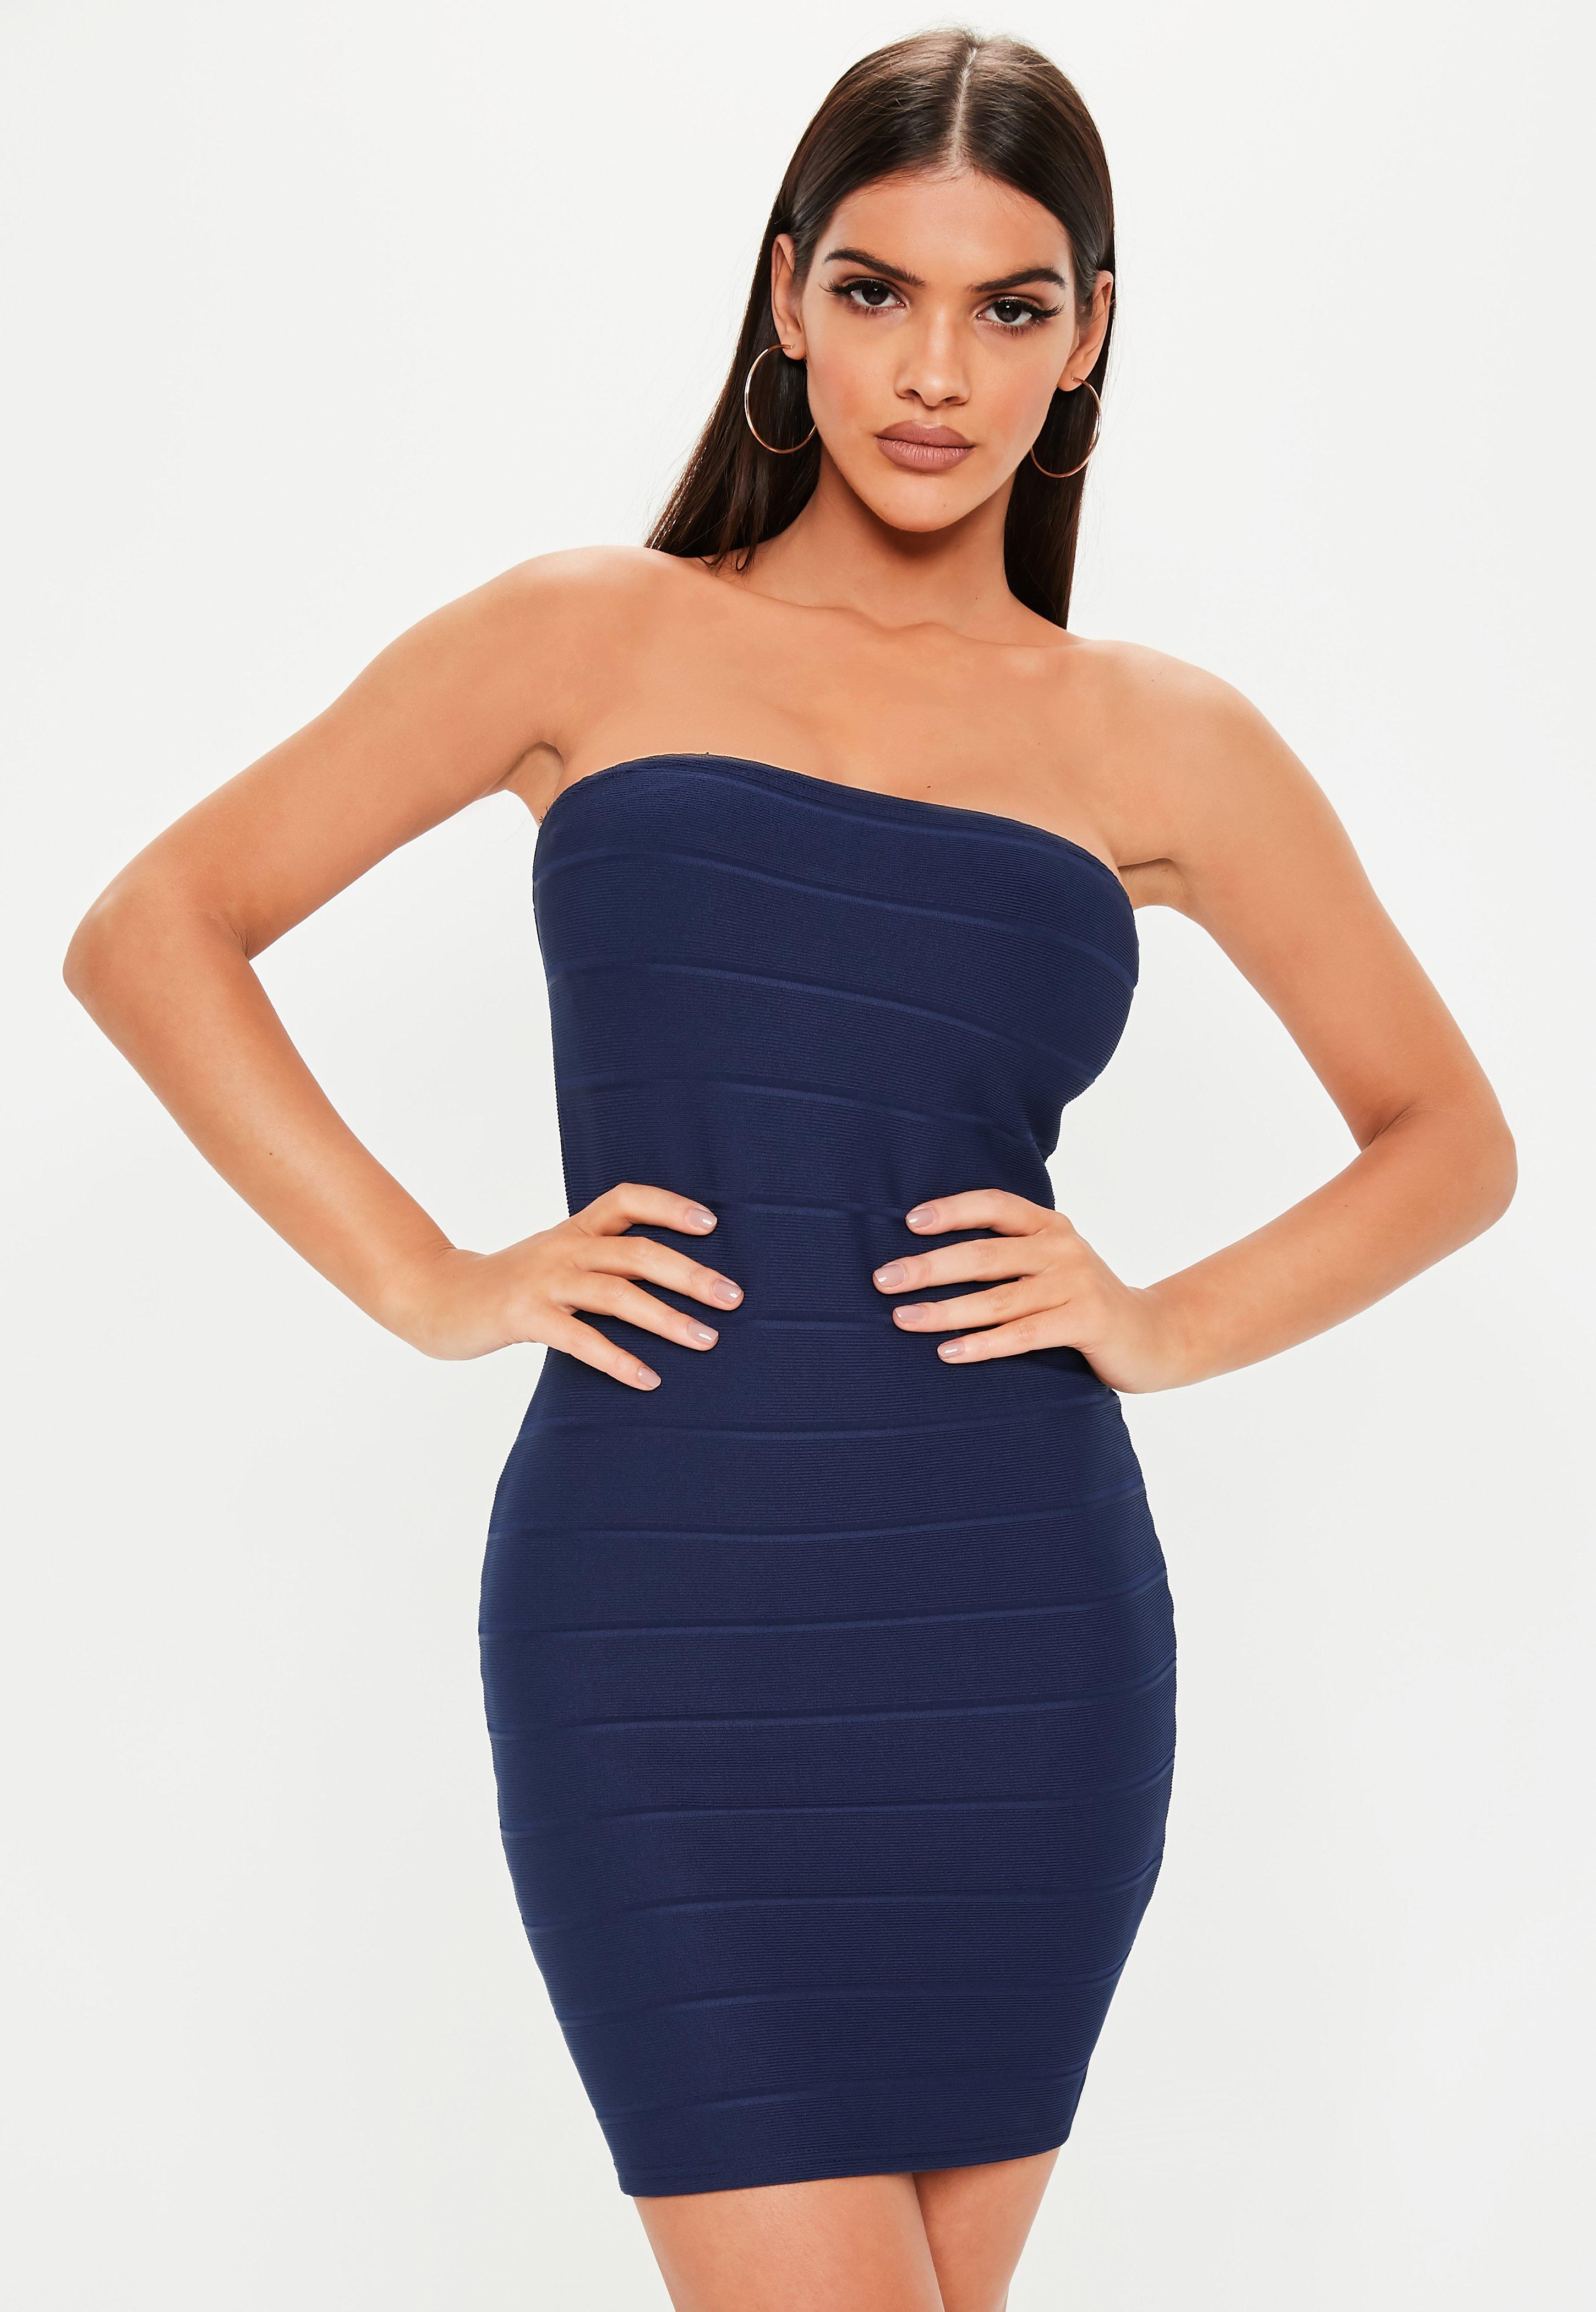 32244654b Fashion Black Blue Burgundy Bodycon Bandage Trousers Life Is